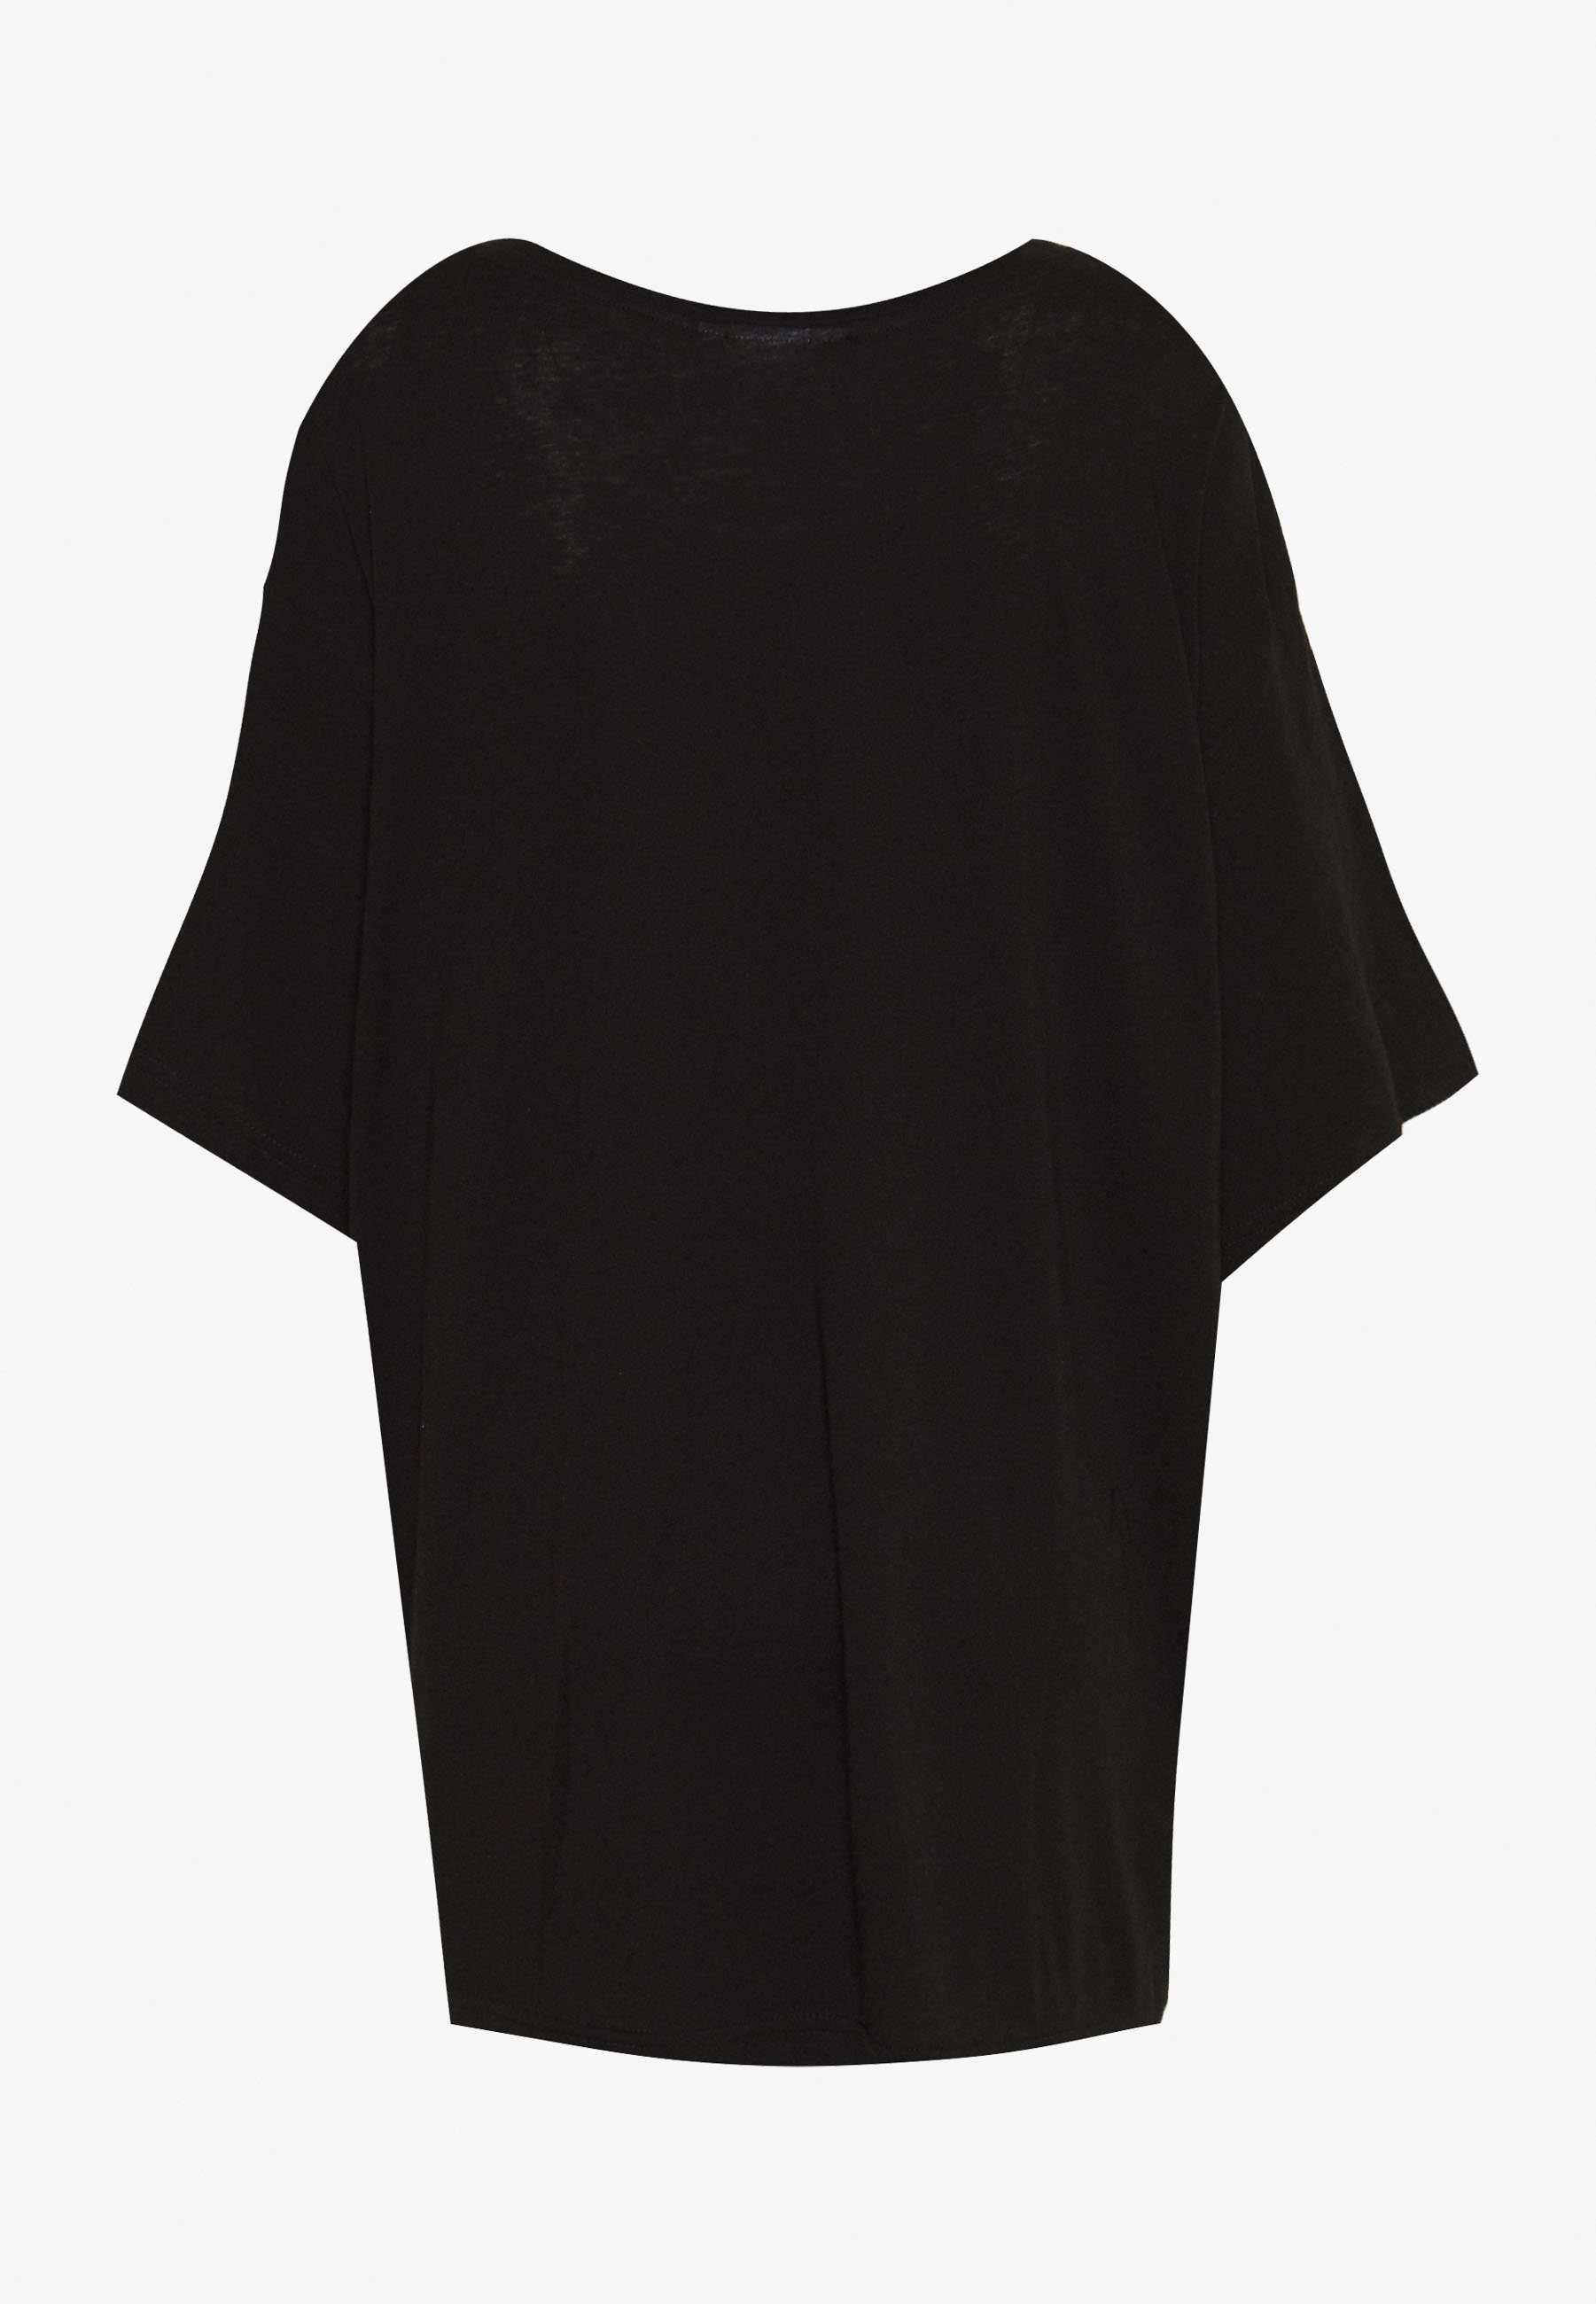 Weekday Rebecca - T-shirts Black/svart